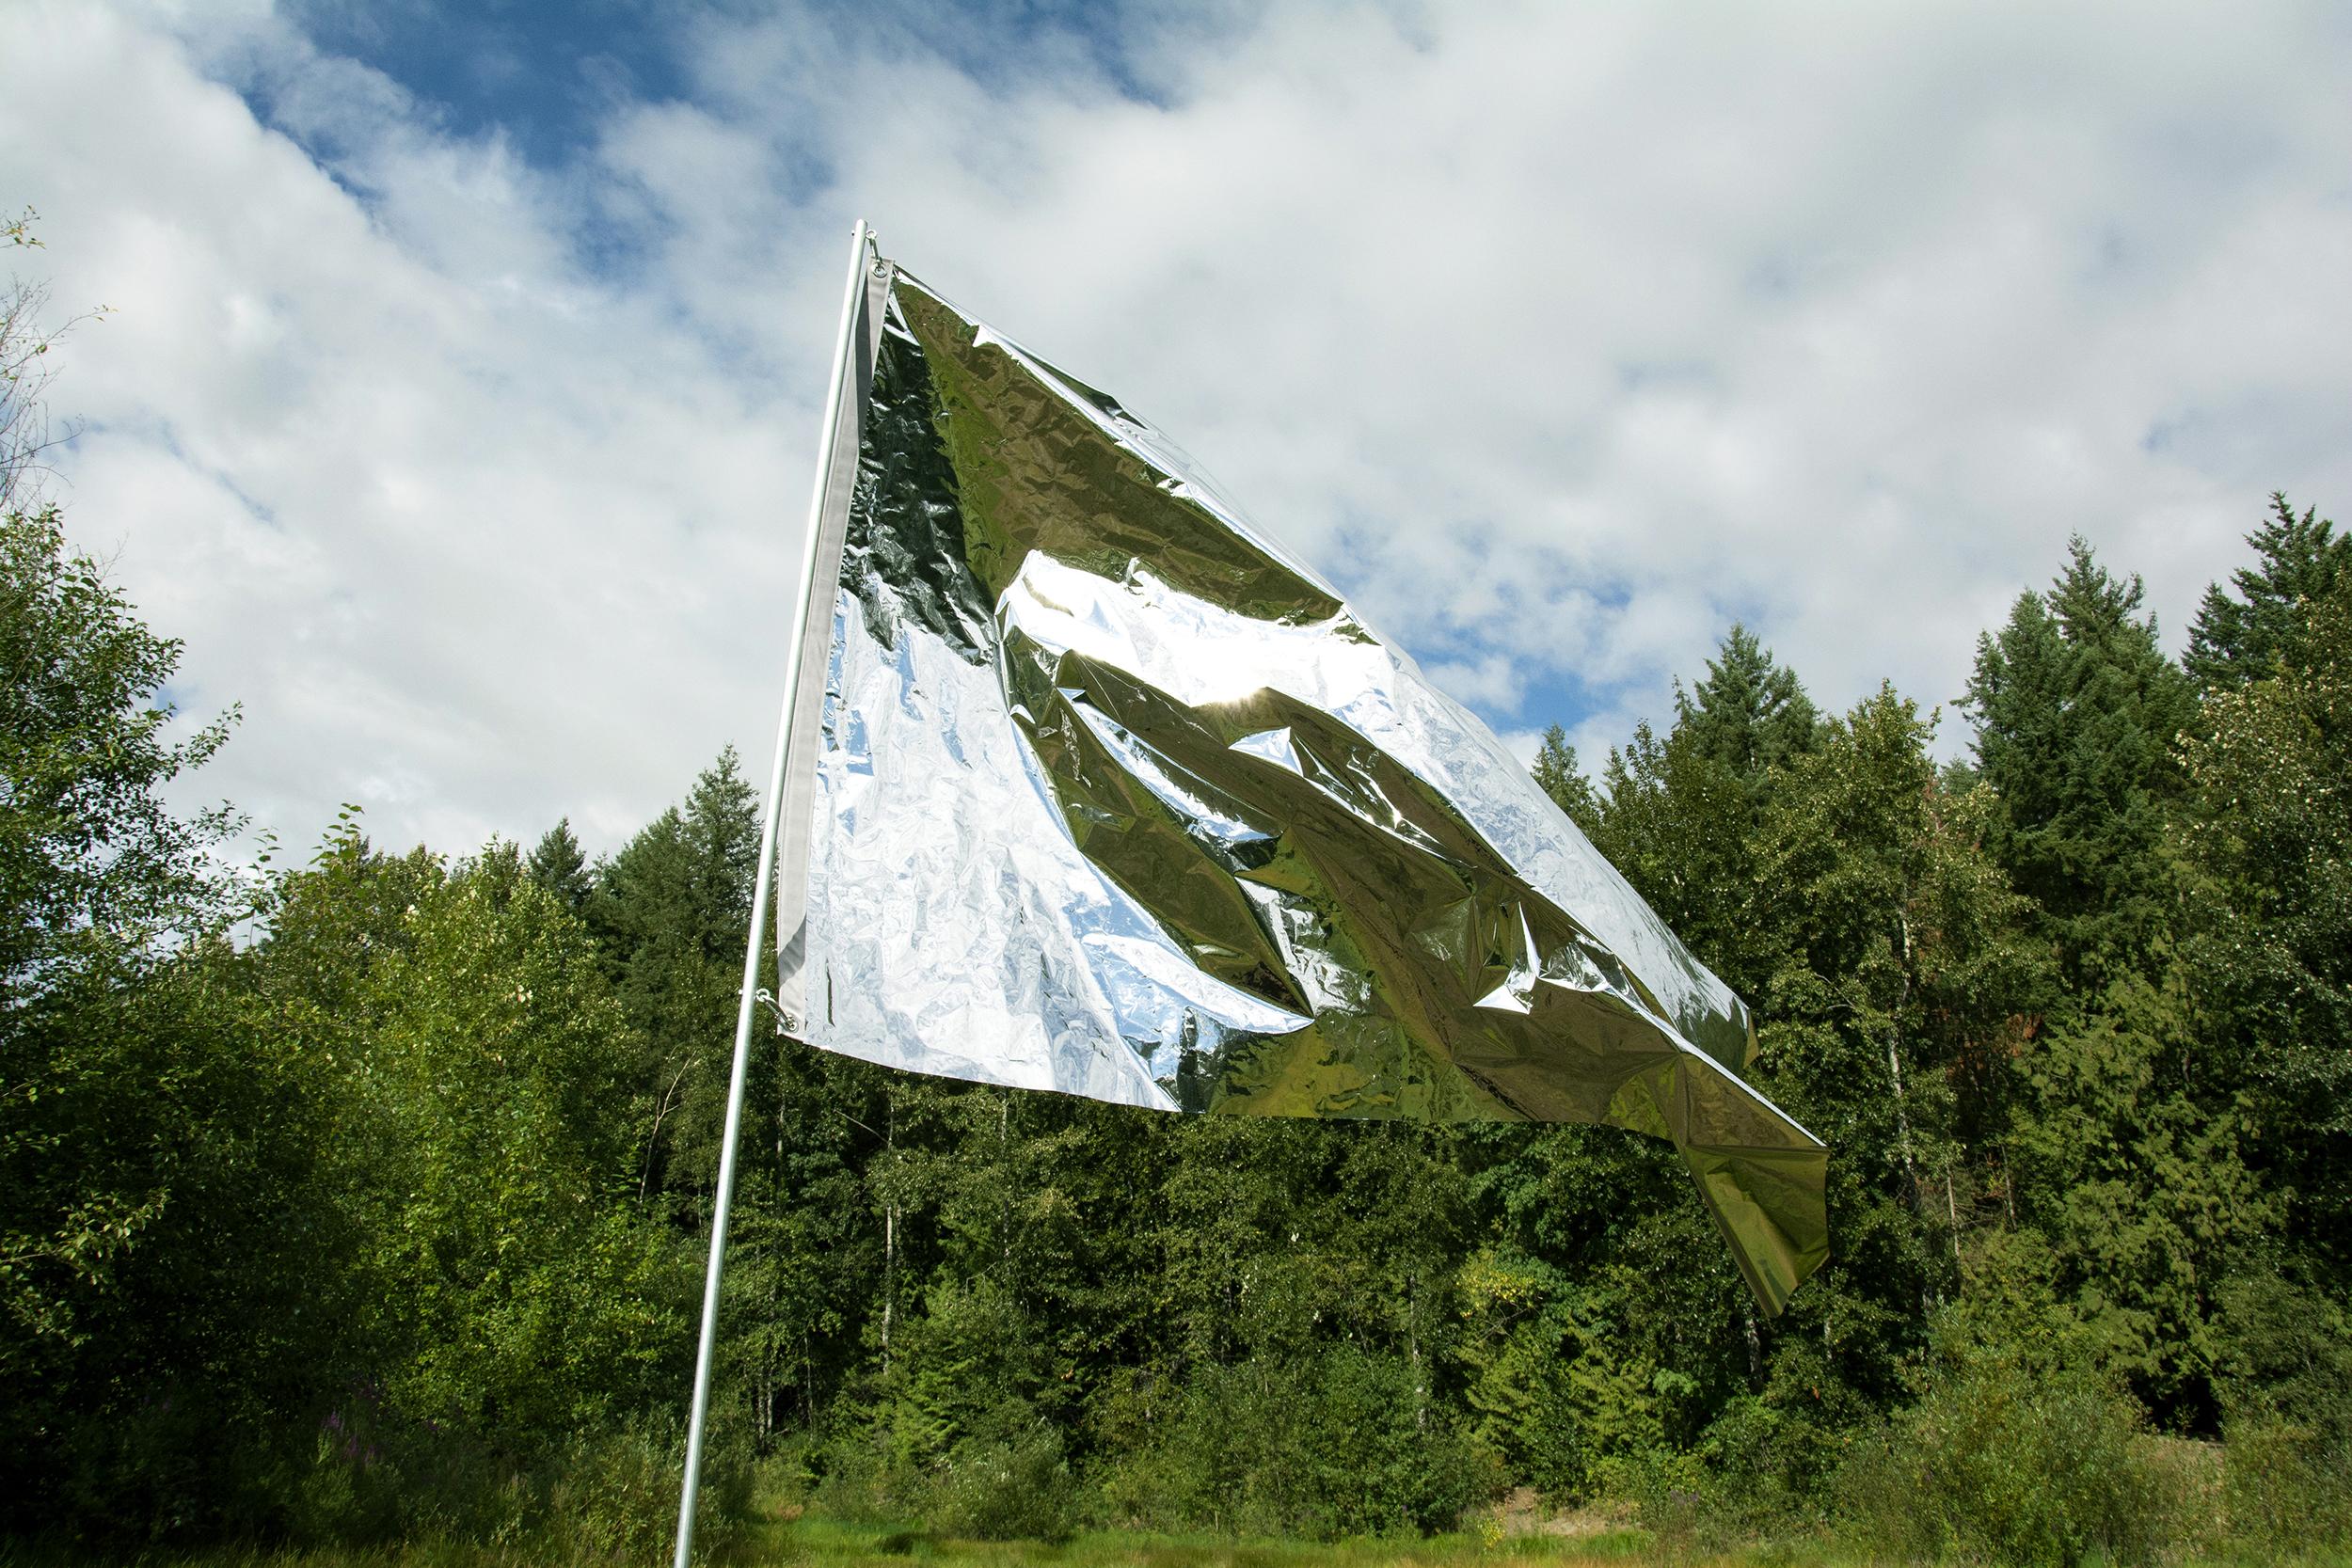 180822_MERCURY Flags_Latimer_0028_M.jpg